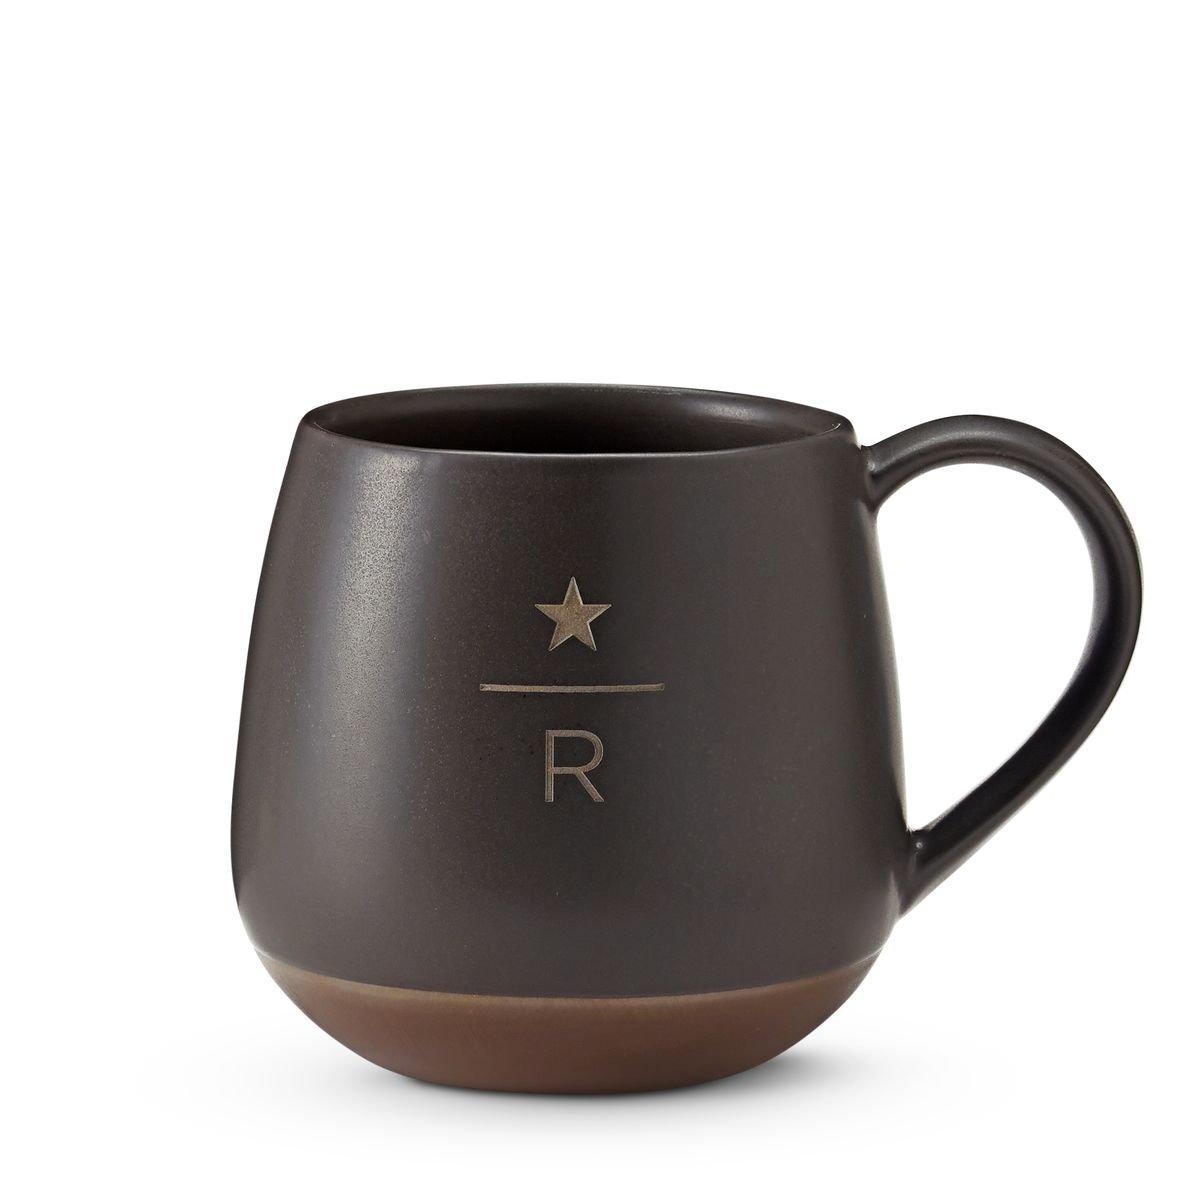 Starbucks Reserve Mug–チャコール、12fl oz